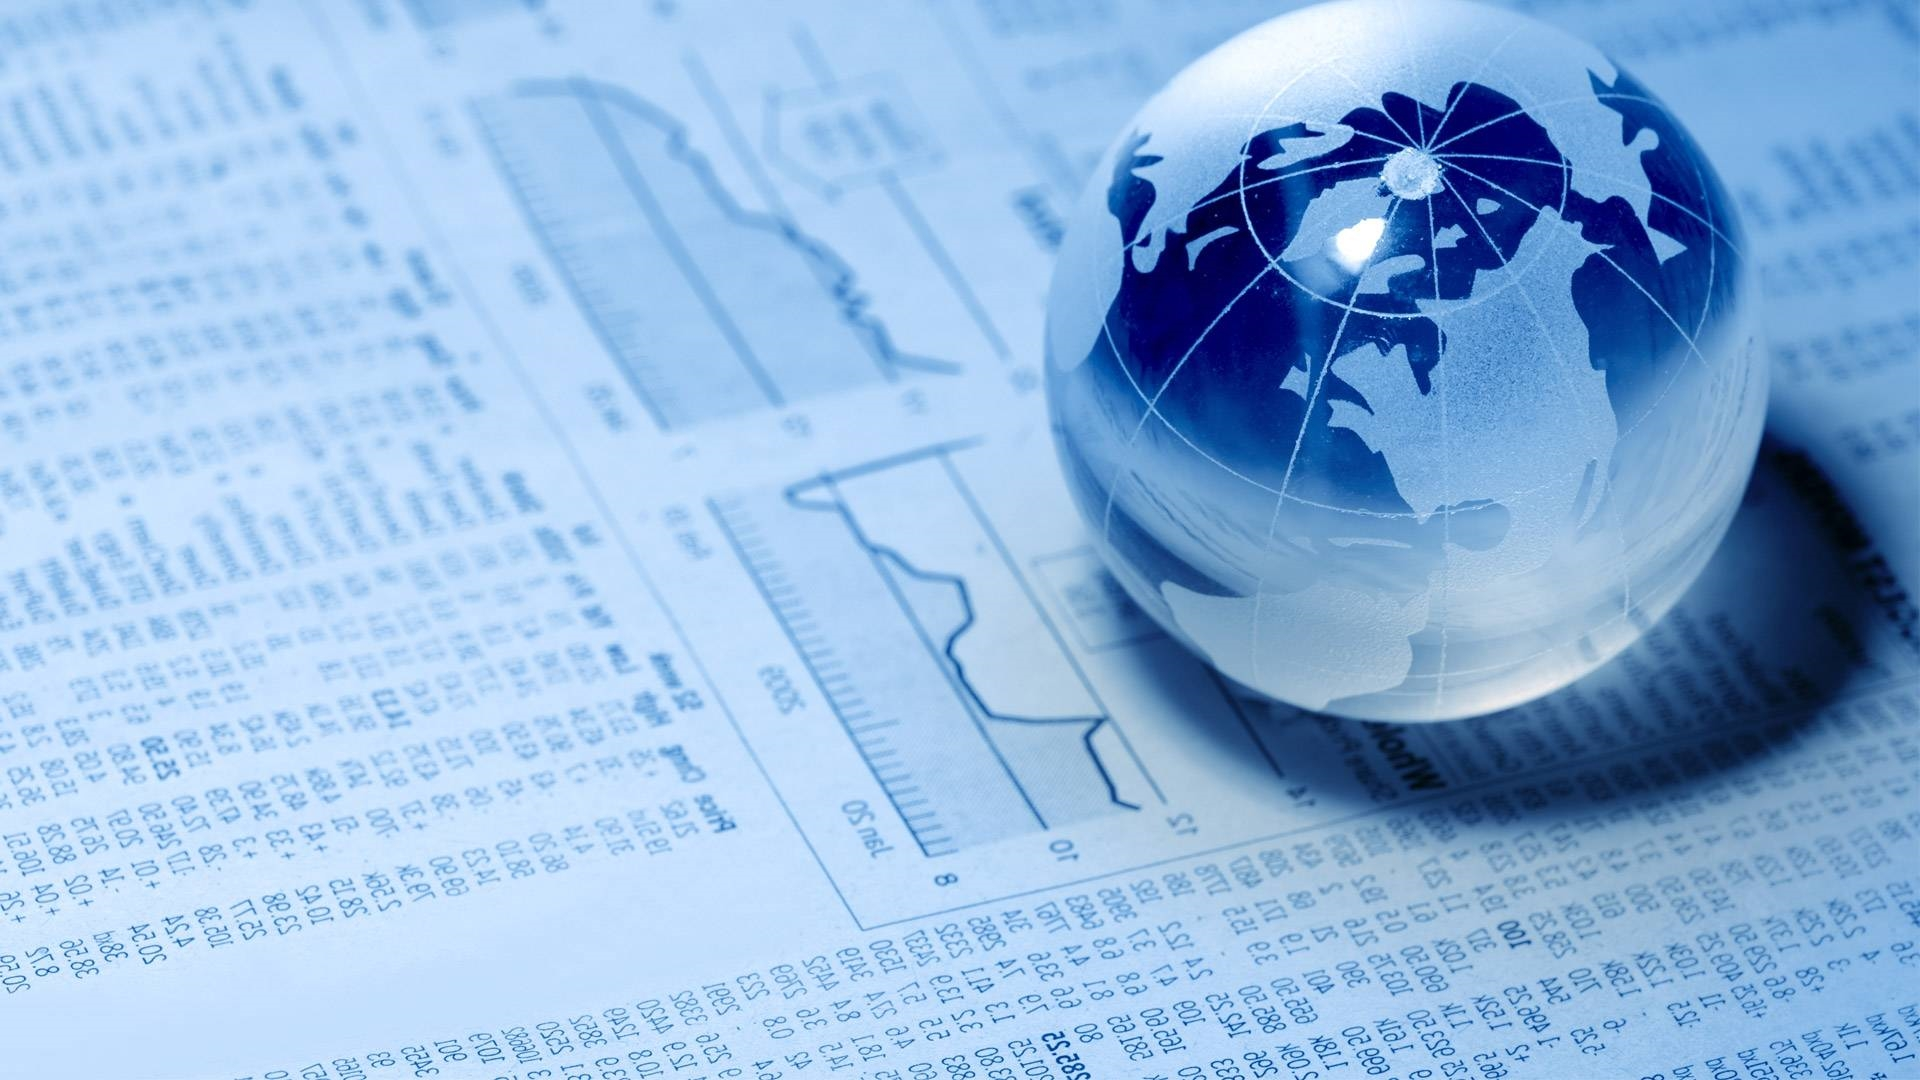 Presentation Economy Desktop Wallpaper